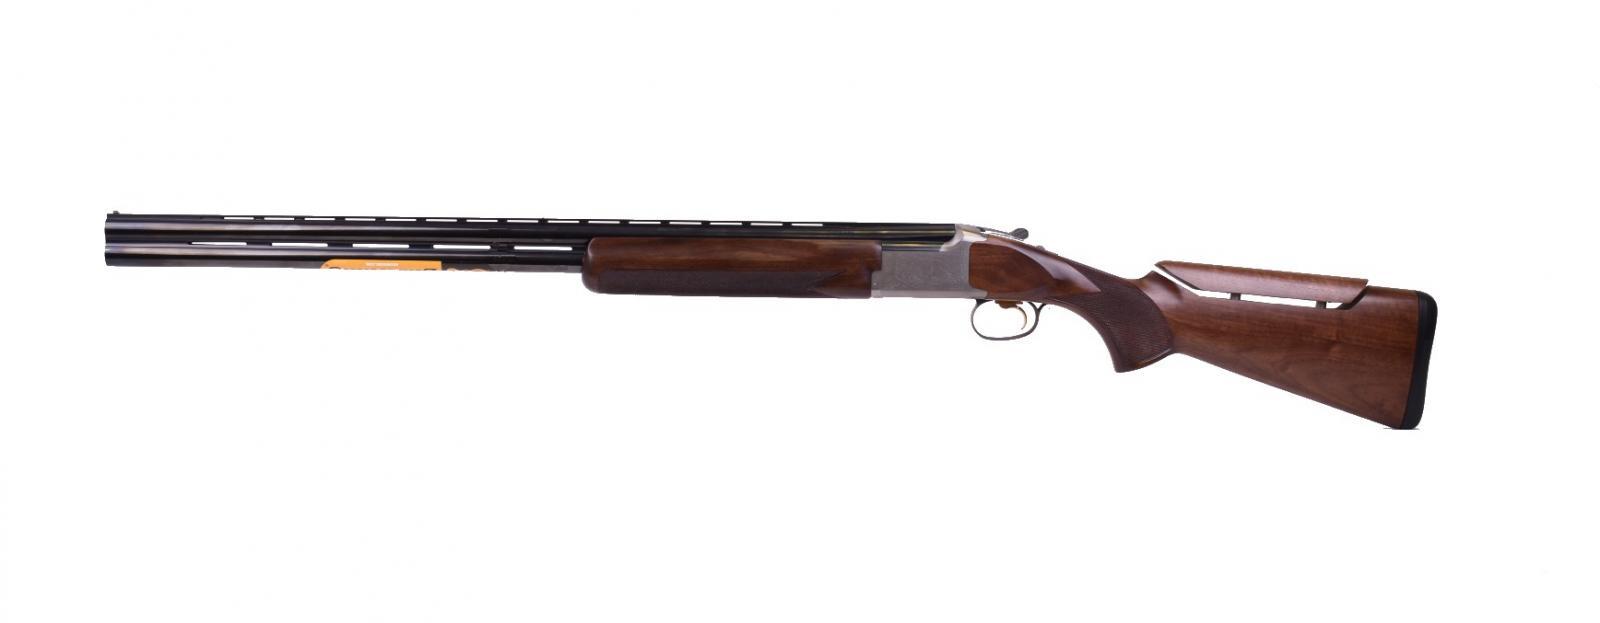 Fusil superposé BROWNING B525 Sporter Trap Canon 76cm Cal. 12/76